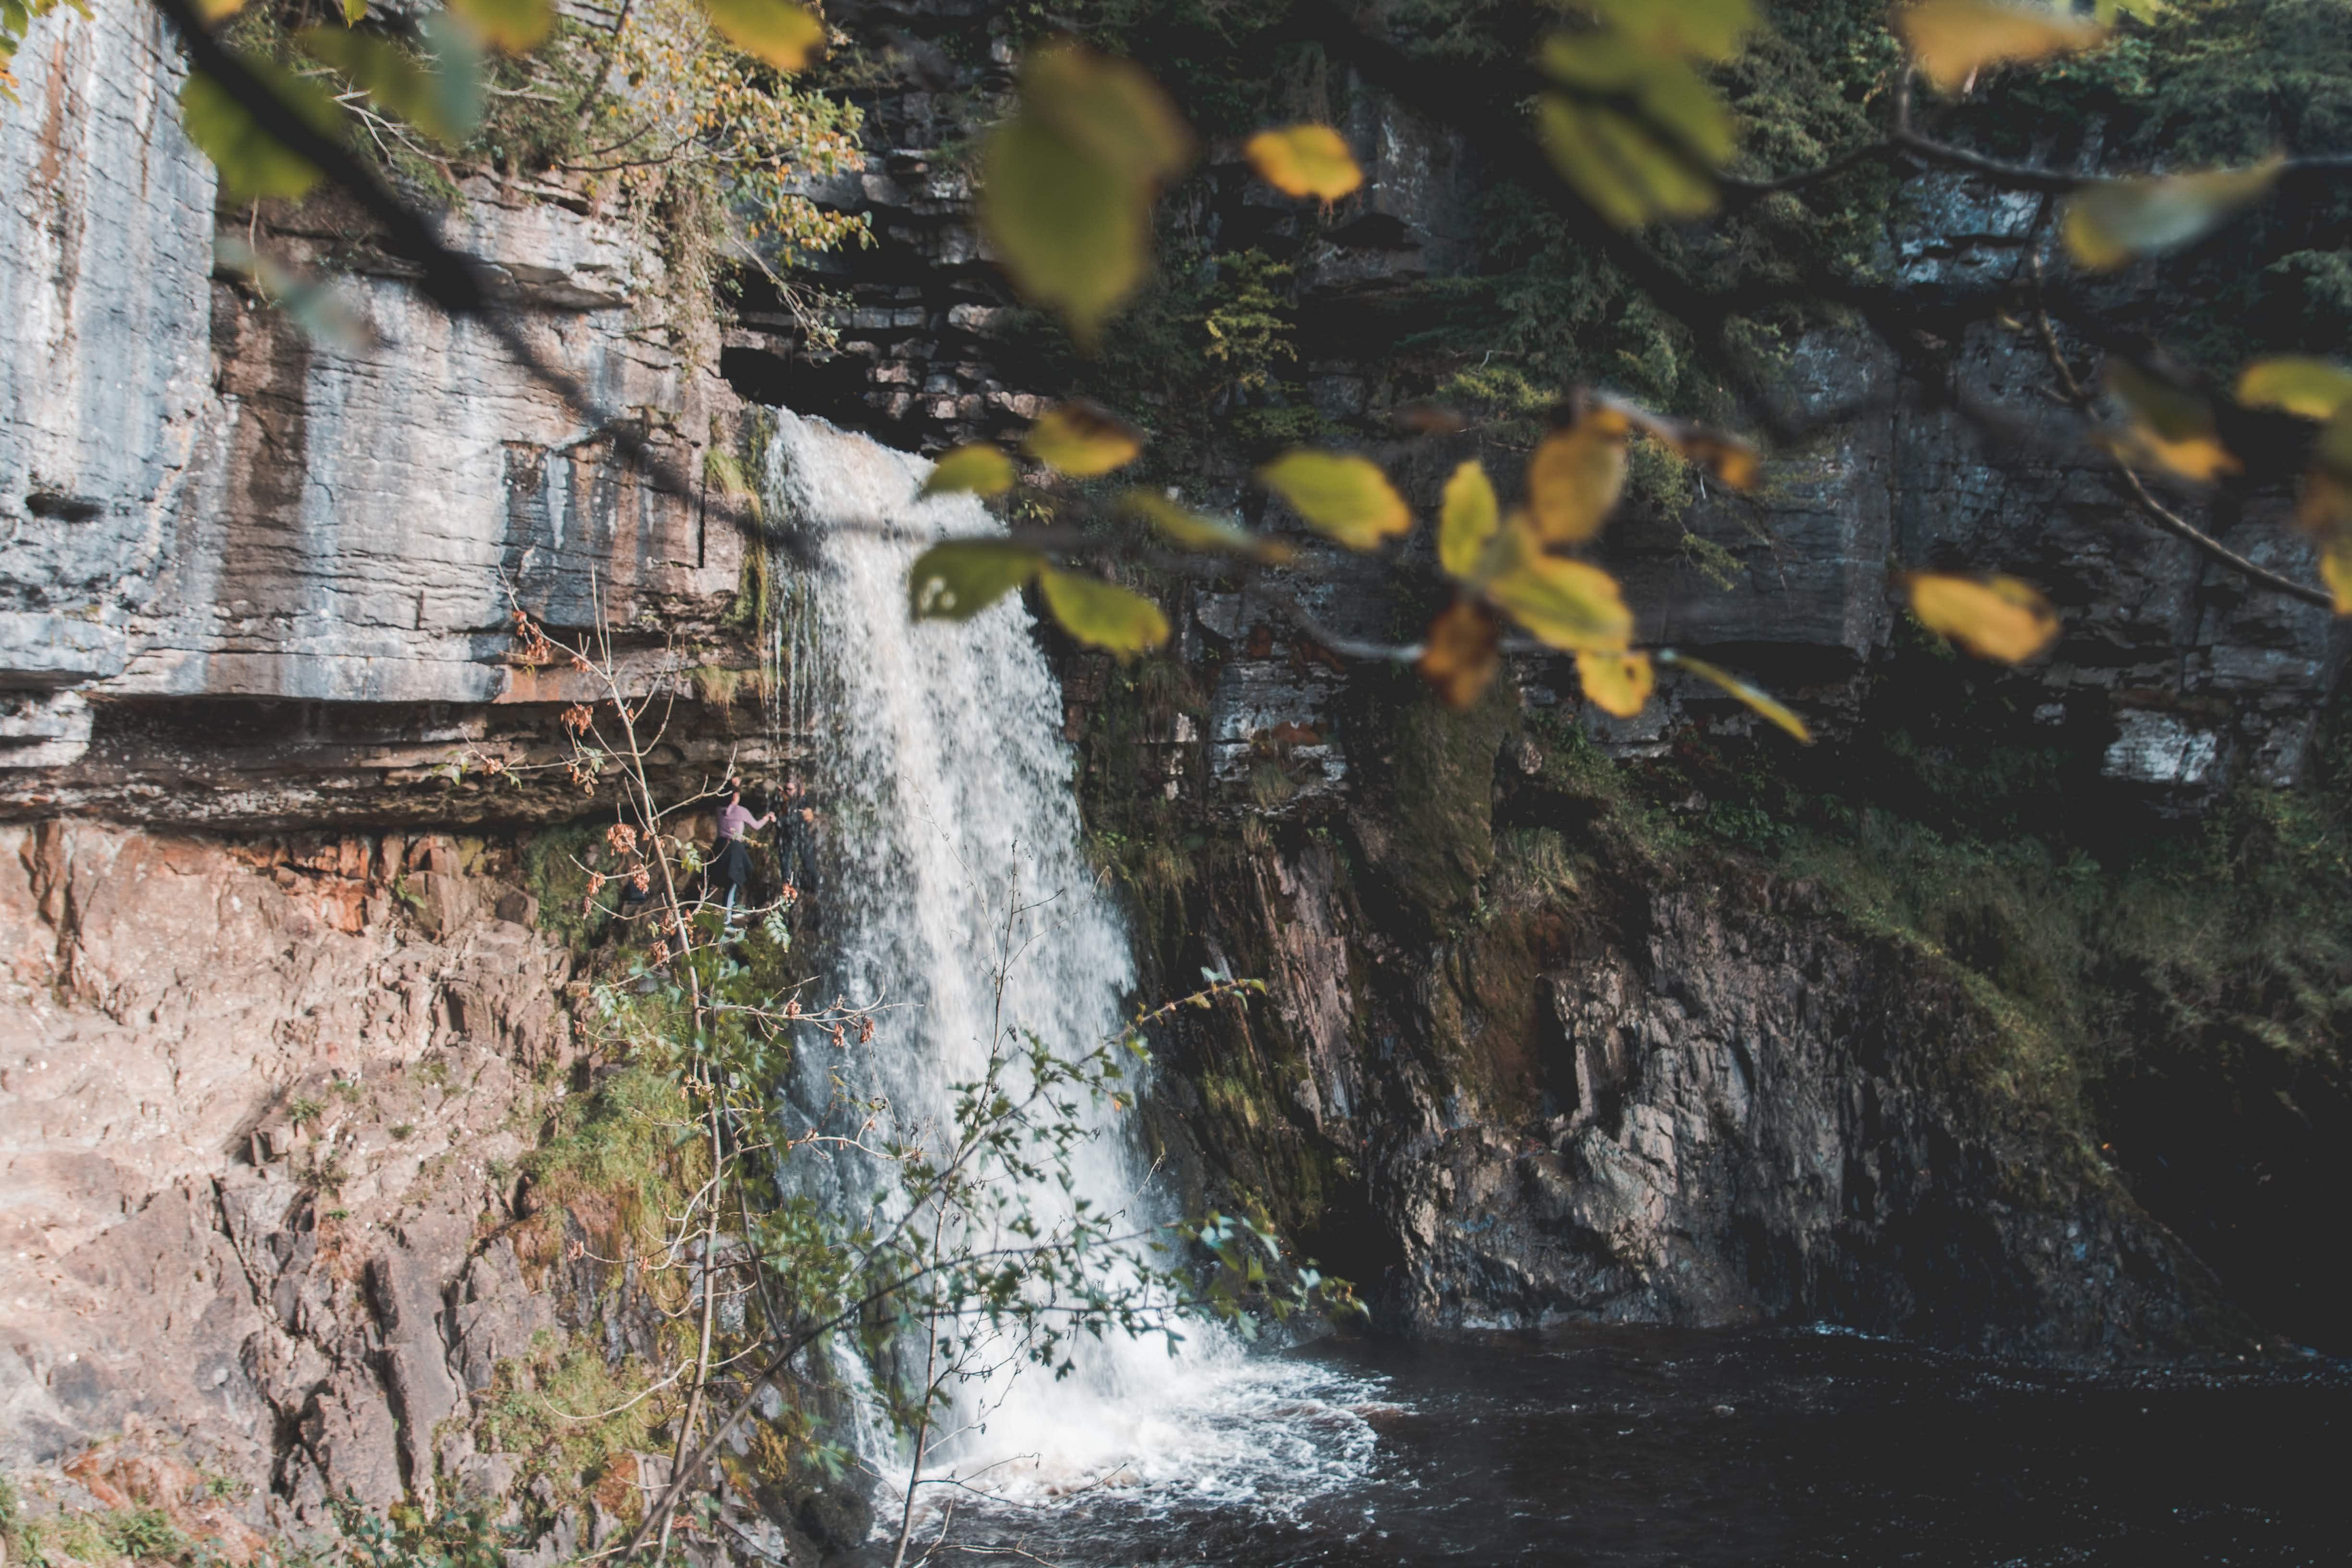 Blahmantung waterfalls, Activities Near Tirta Gangga Water Palace